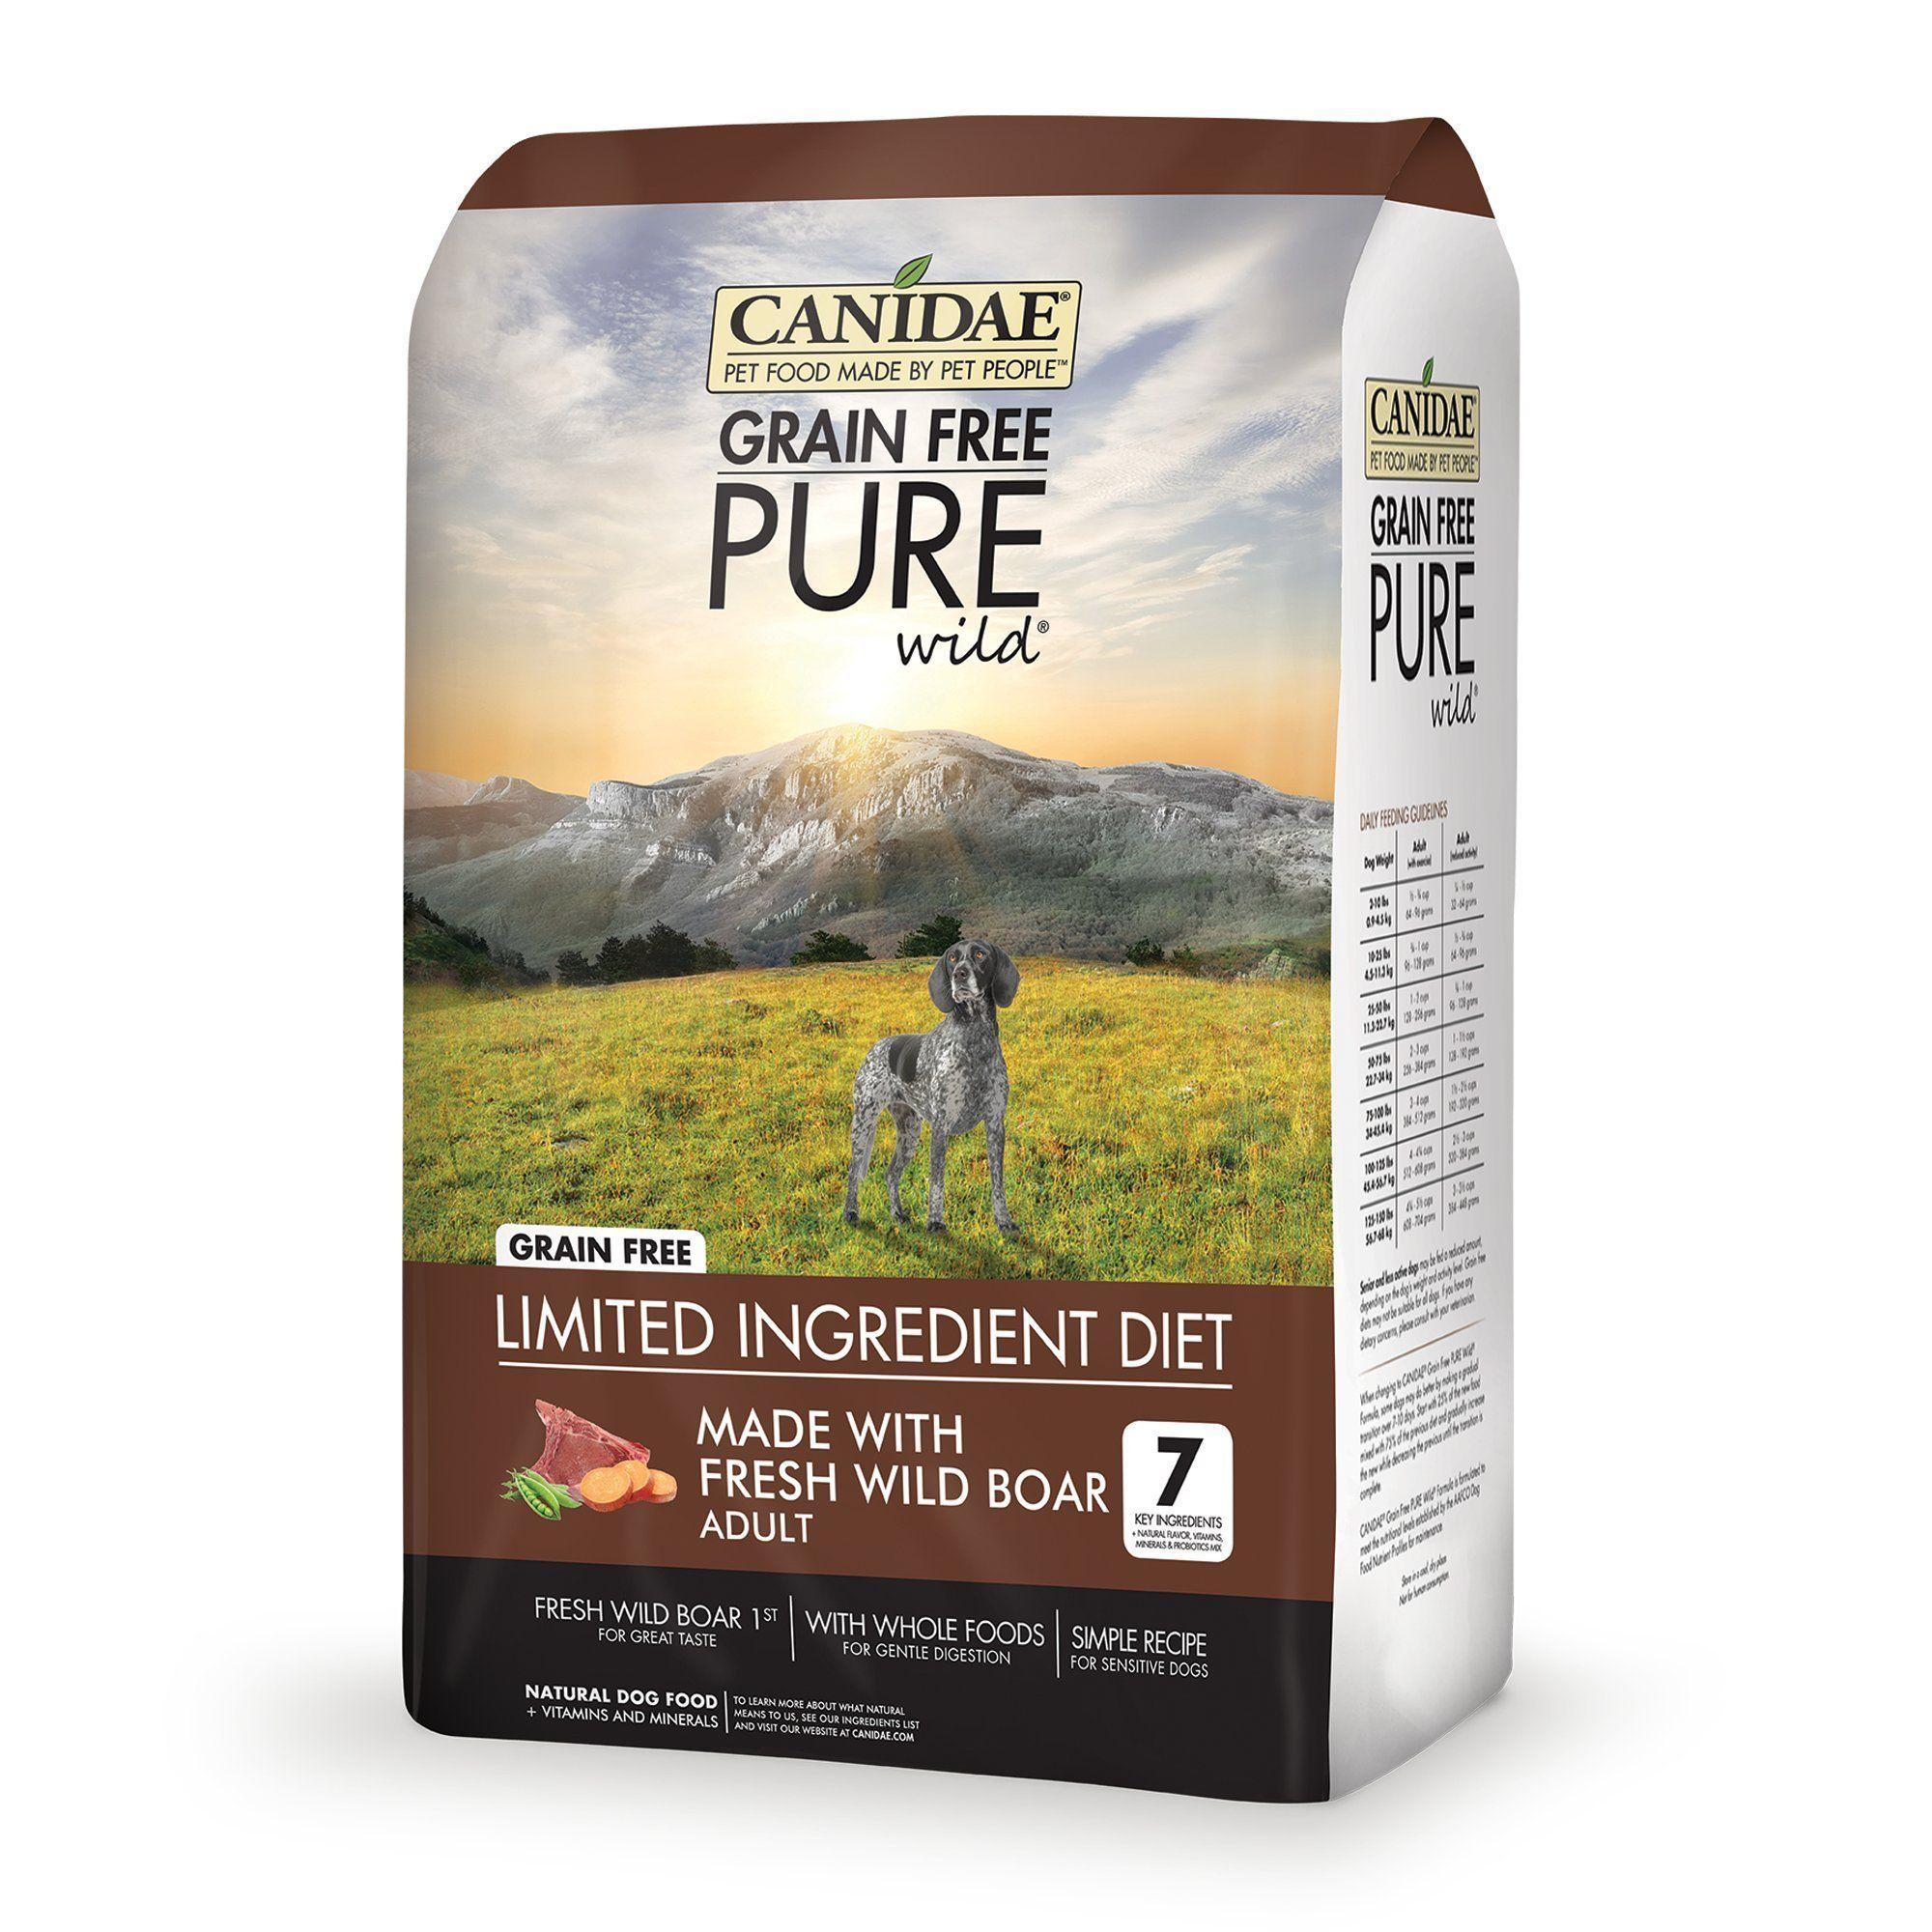 Canidae Grain Free Pure Wild Adult Fresh Wild Boar Dog Food 4 Lbs